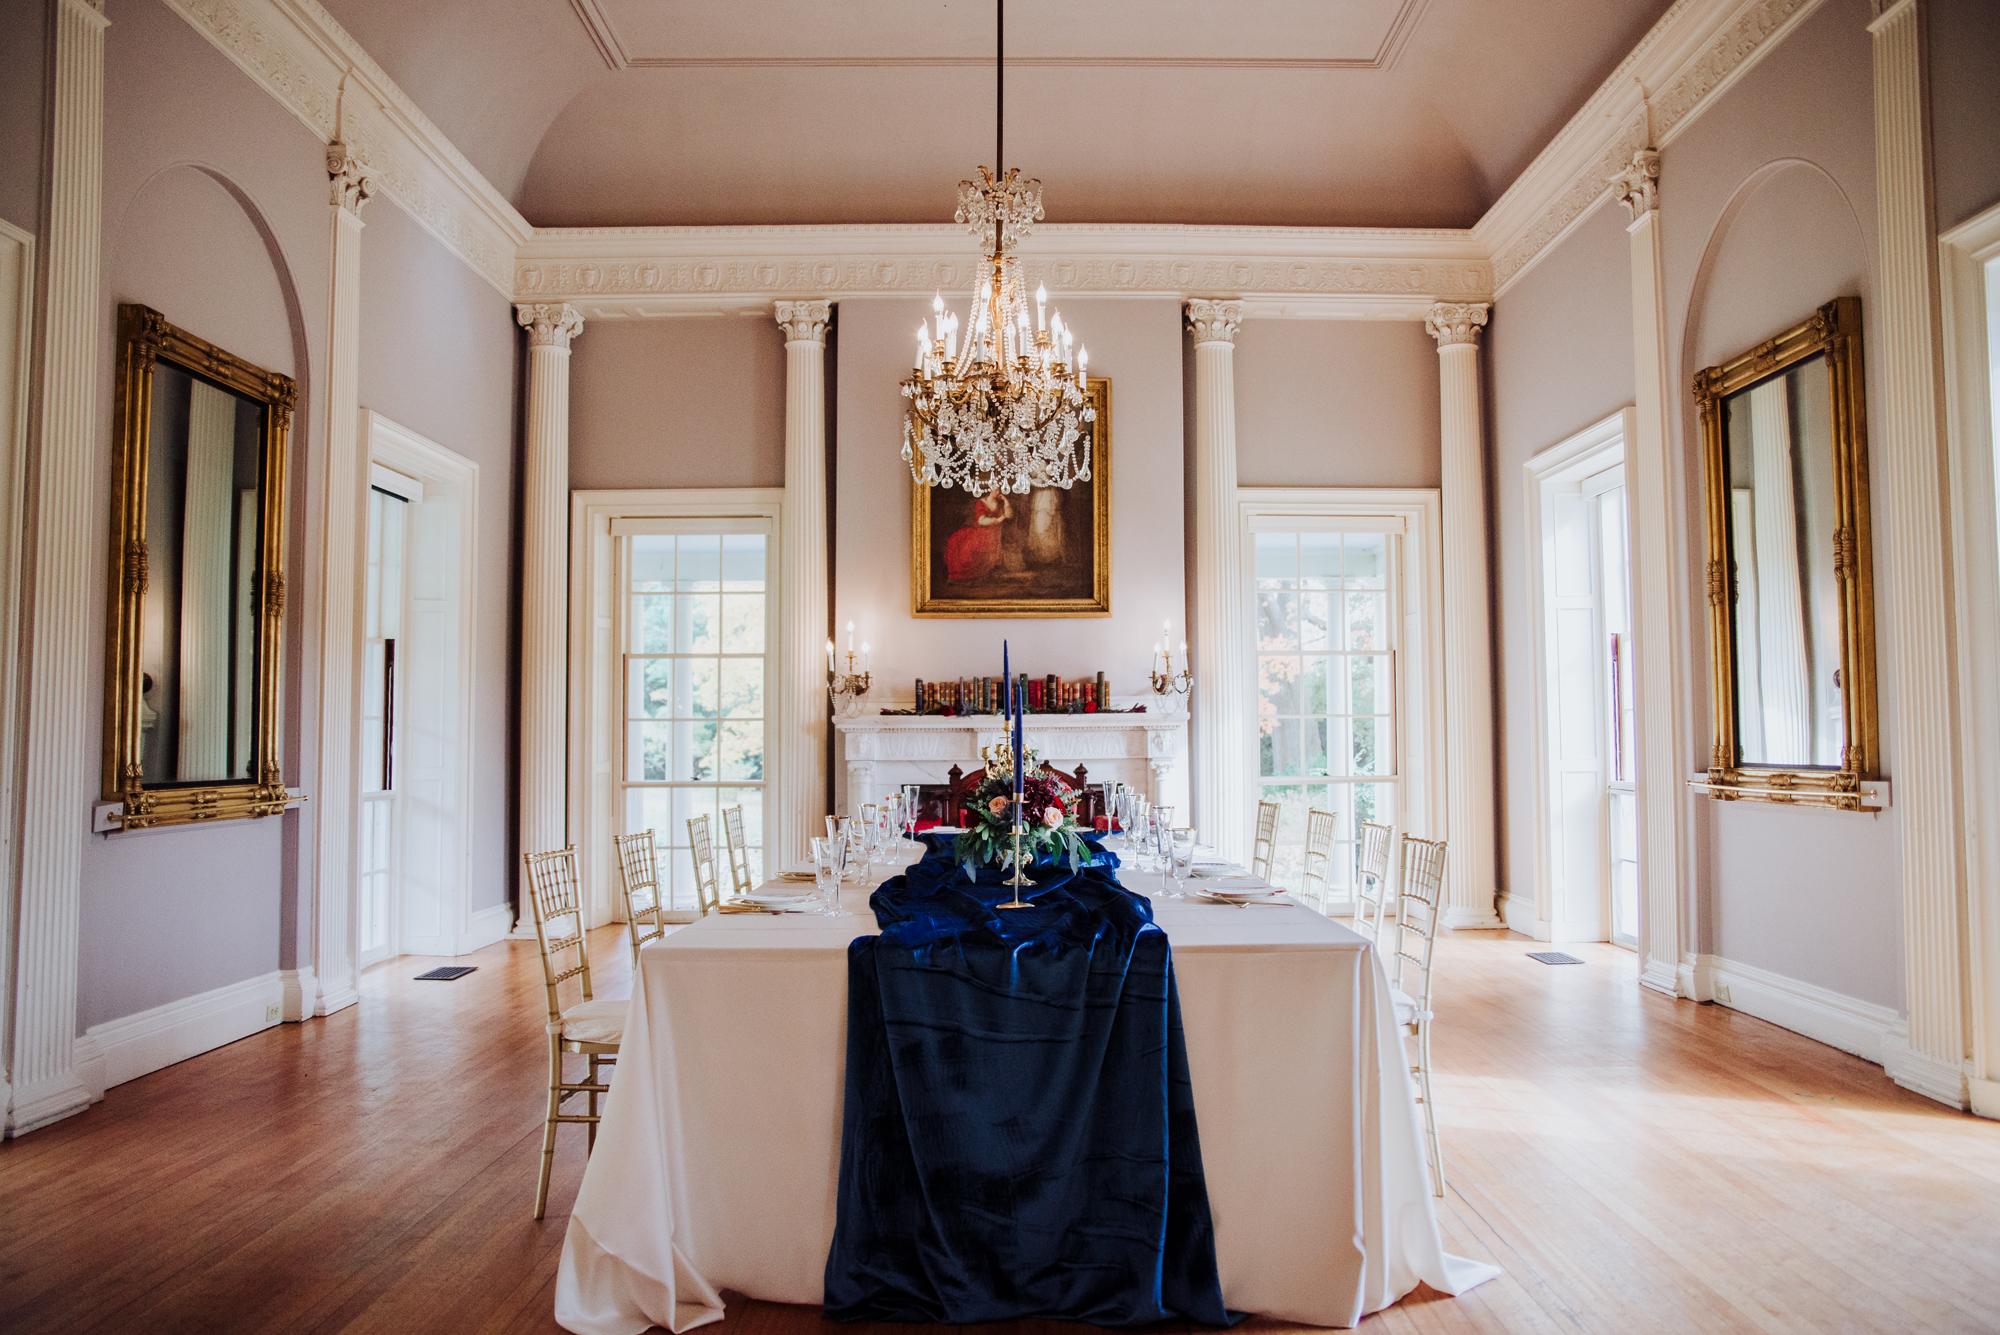 regal lyman estate wedding photoshoot interior